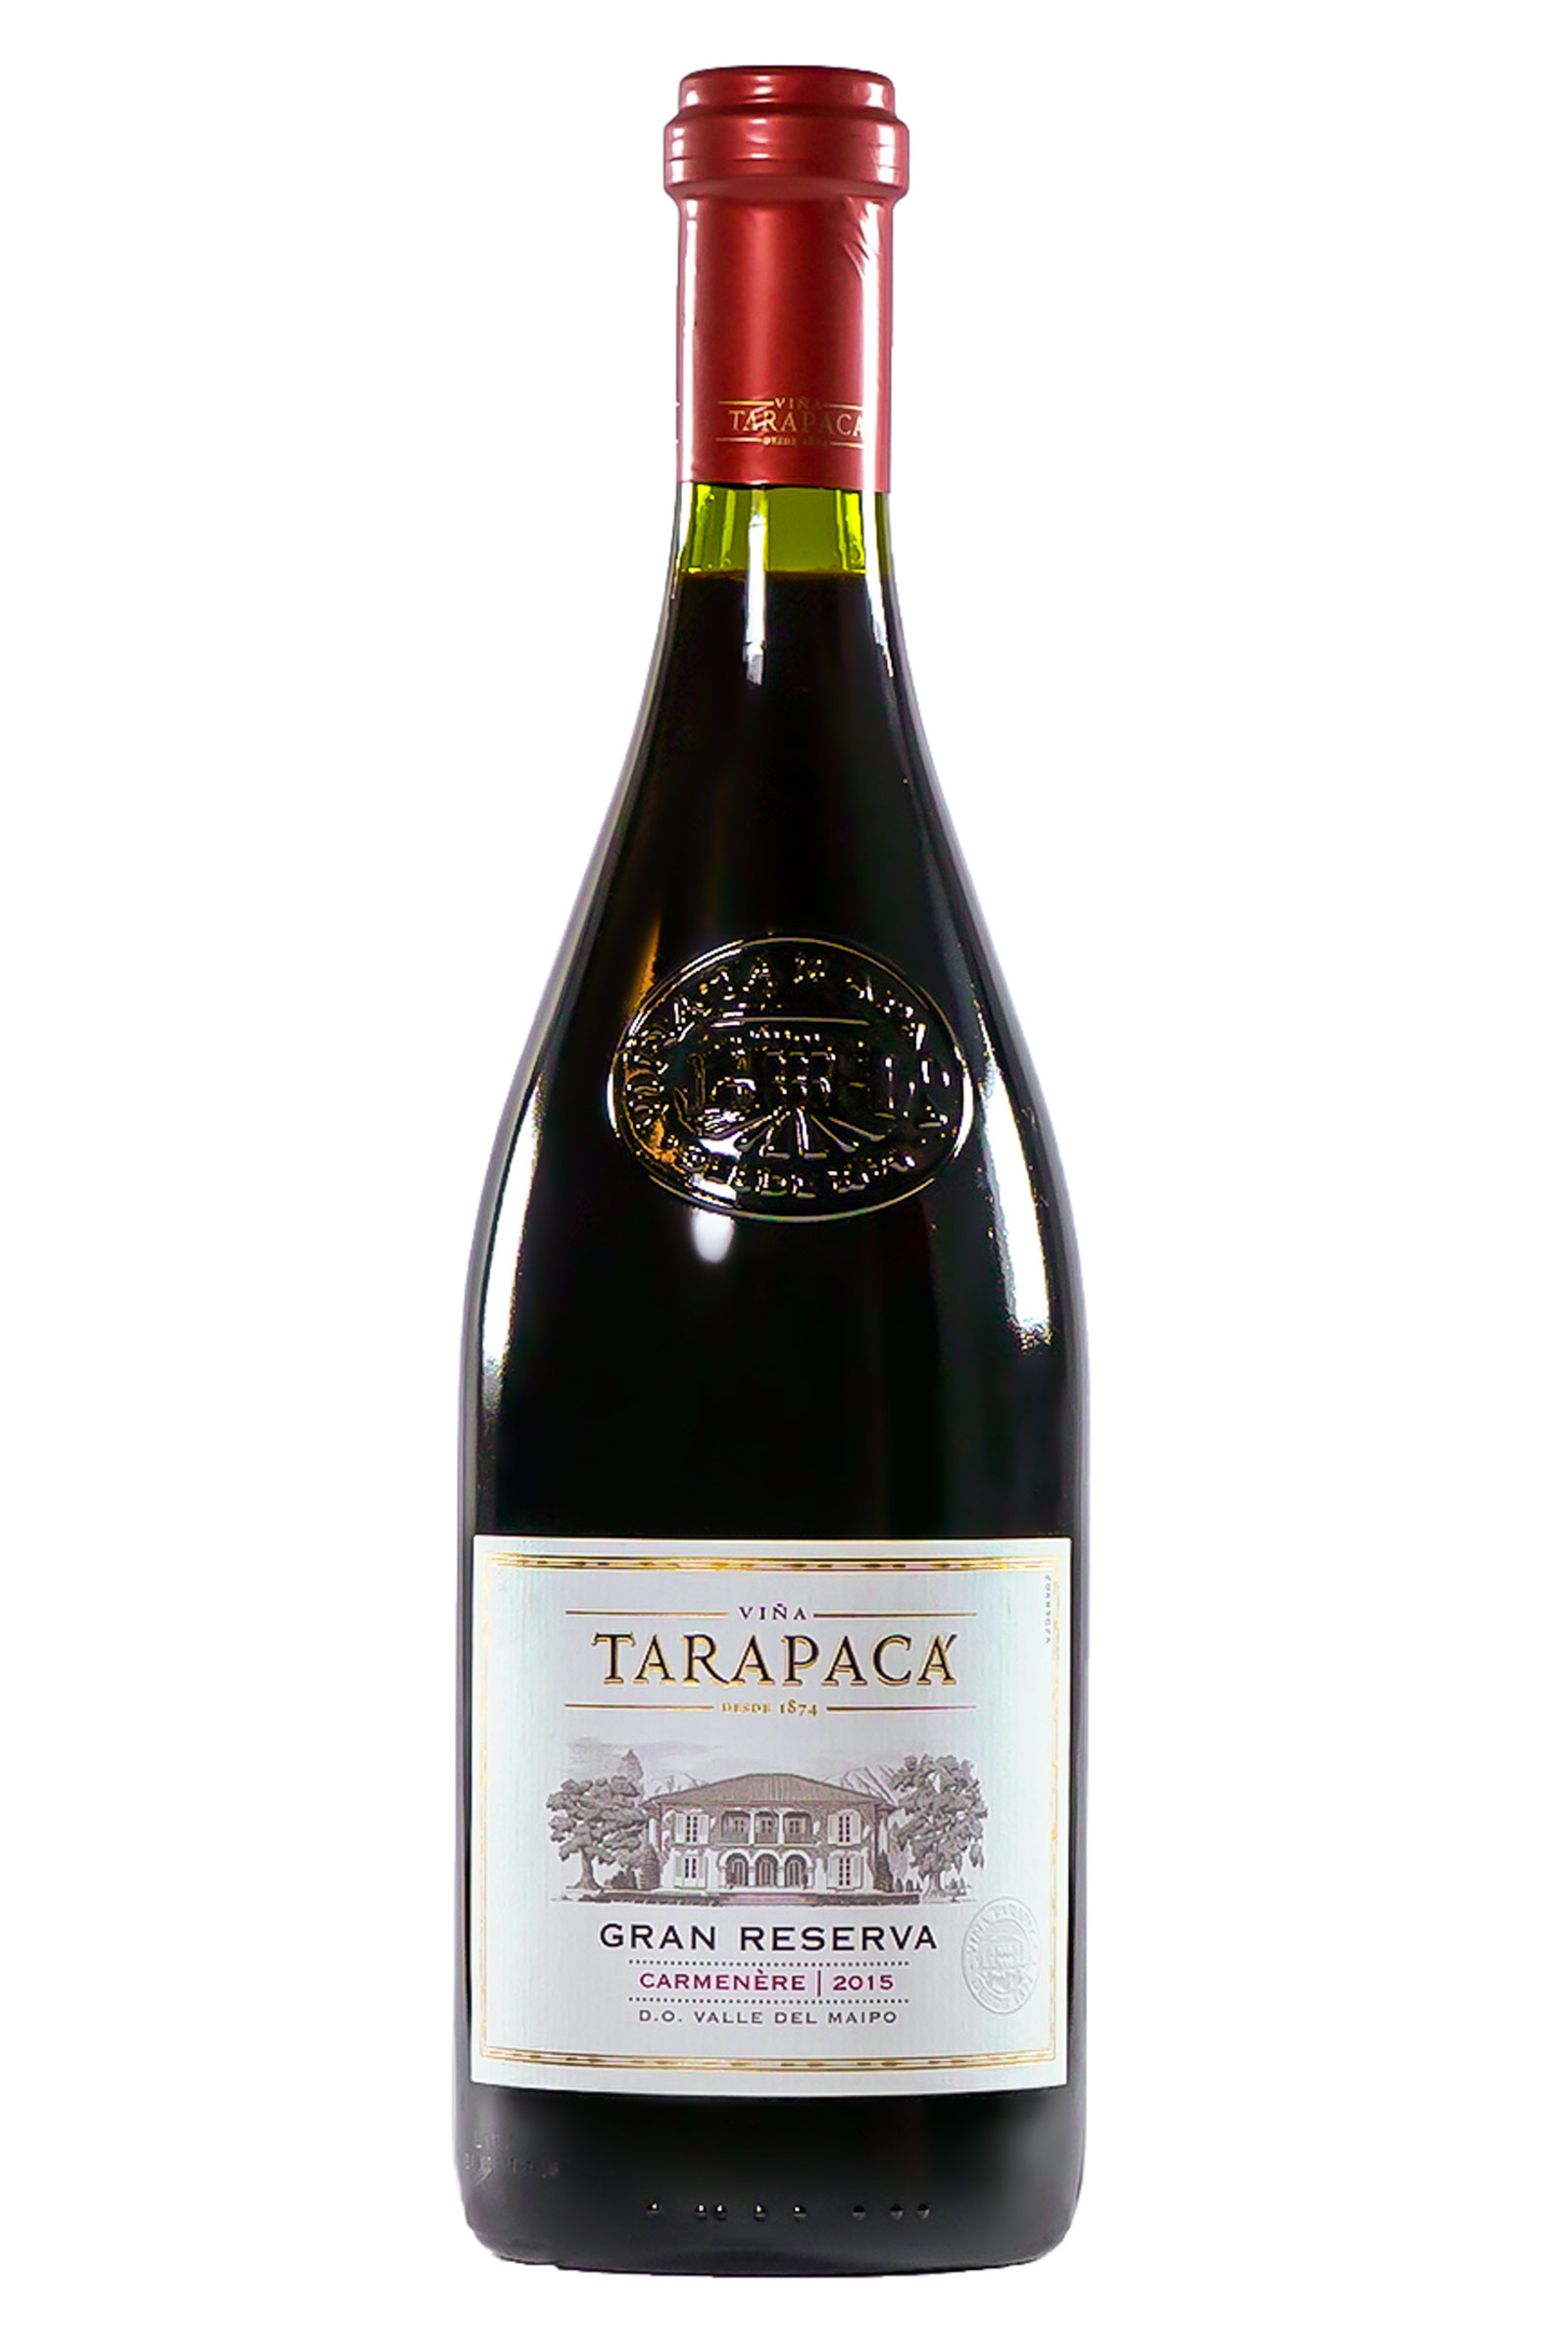 Vino Tarapacá Gran Reserva Carmenere 375ml